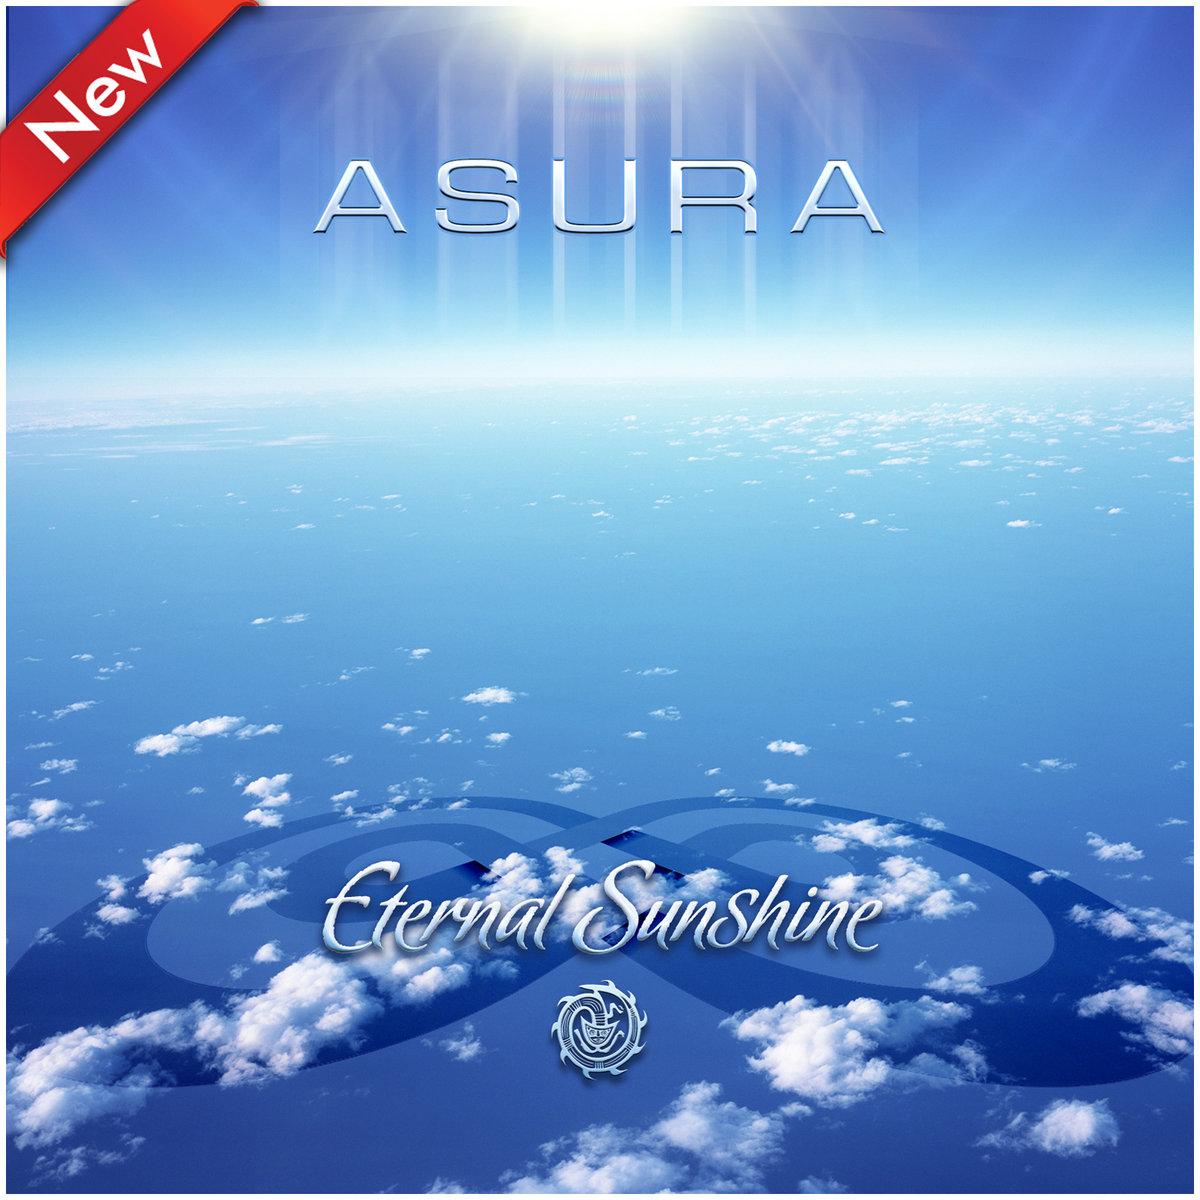 ASURA - Eternal Sunshine @ 'Eternal Sunshine EP' album (electronic, ambient)